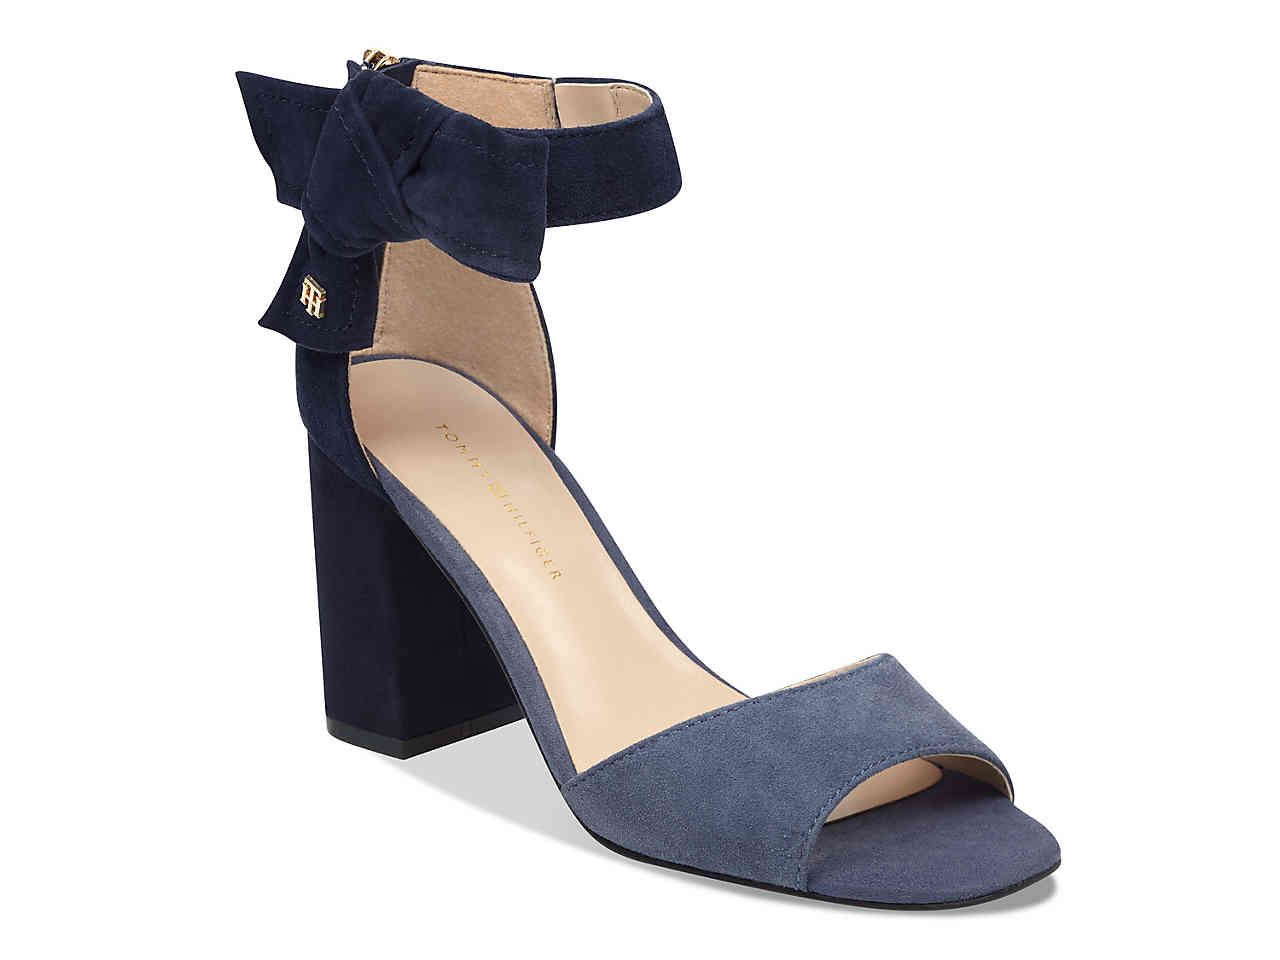 0a839565 Tommy Hilfiger Seera Sandal Women's Shoes | DSW | For Michela in ...